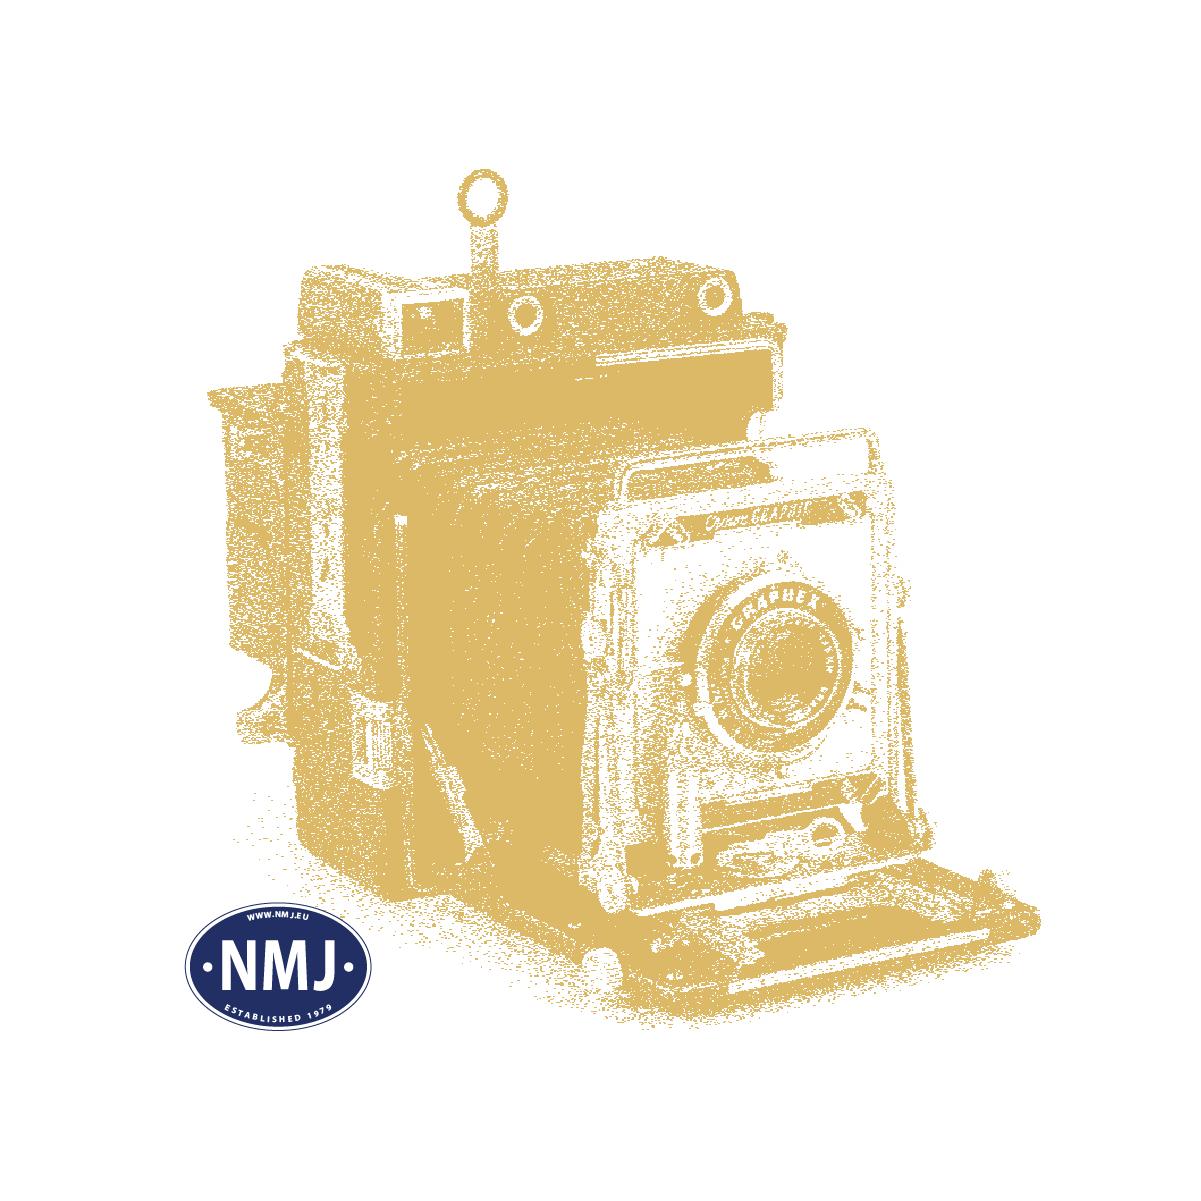 VIE5020 - Elektronisk sveisemodul med lys